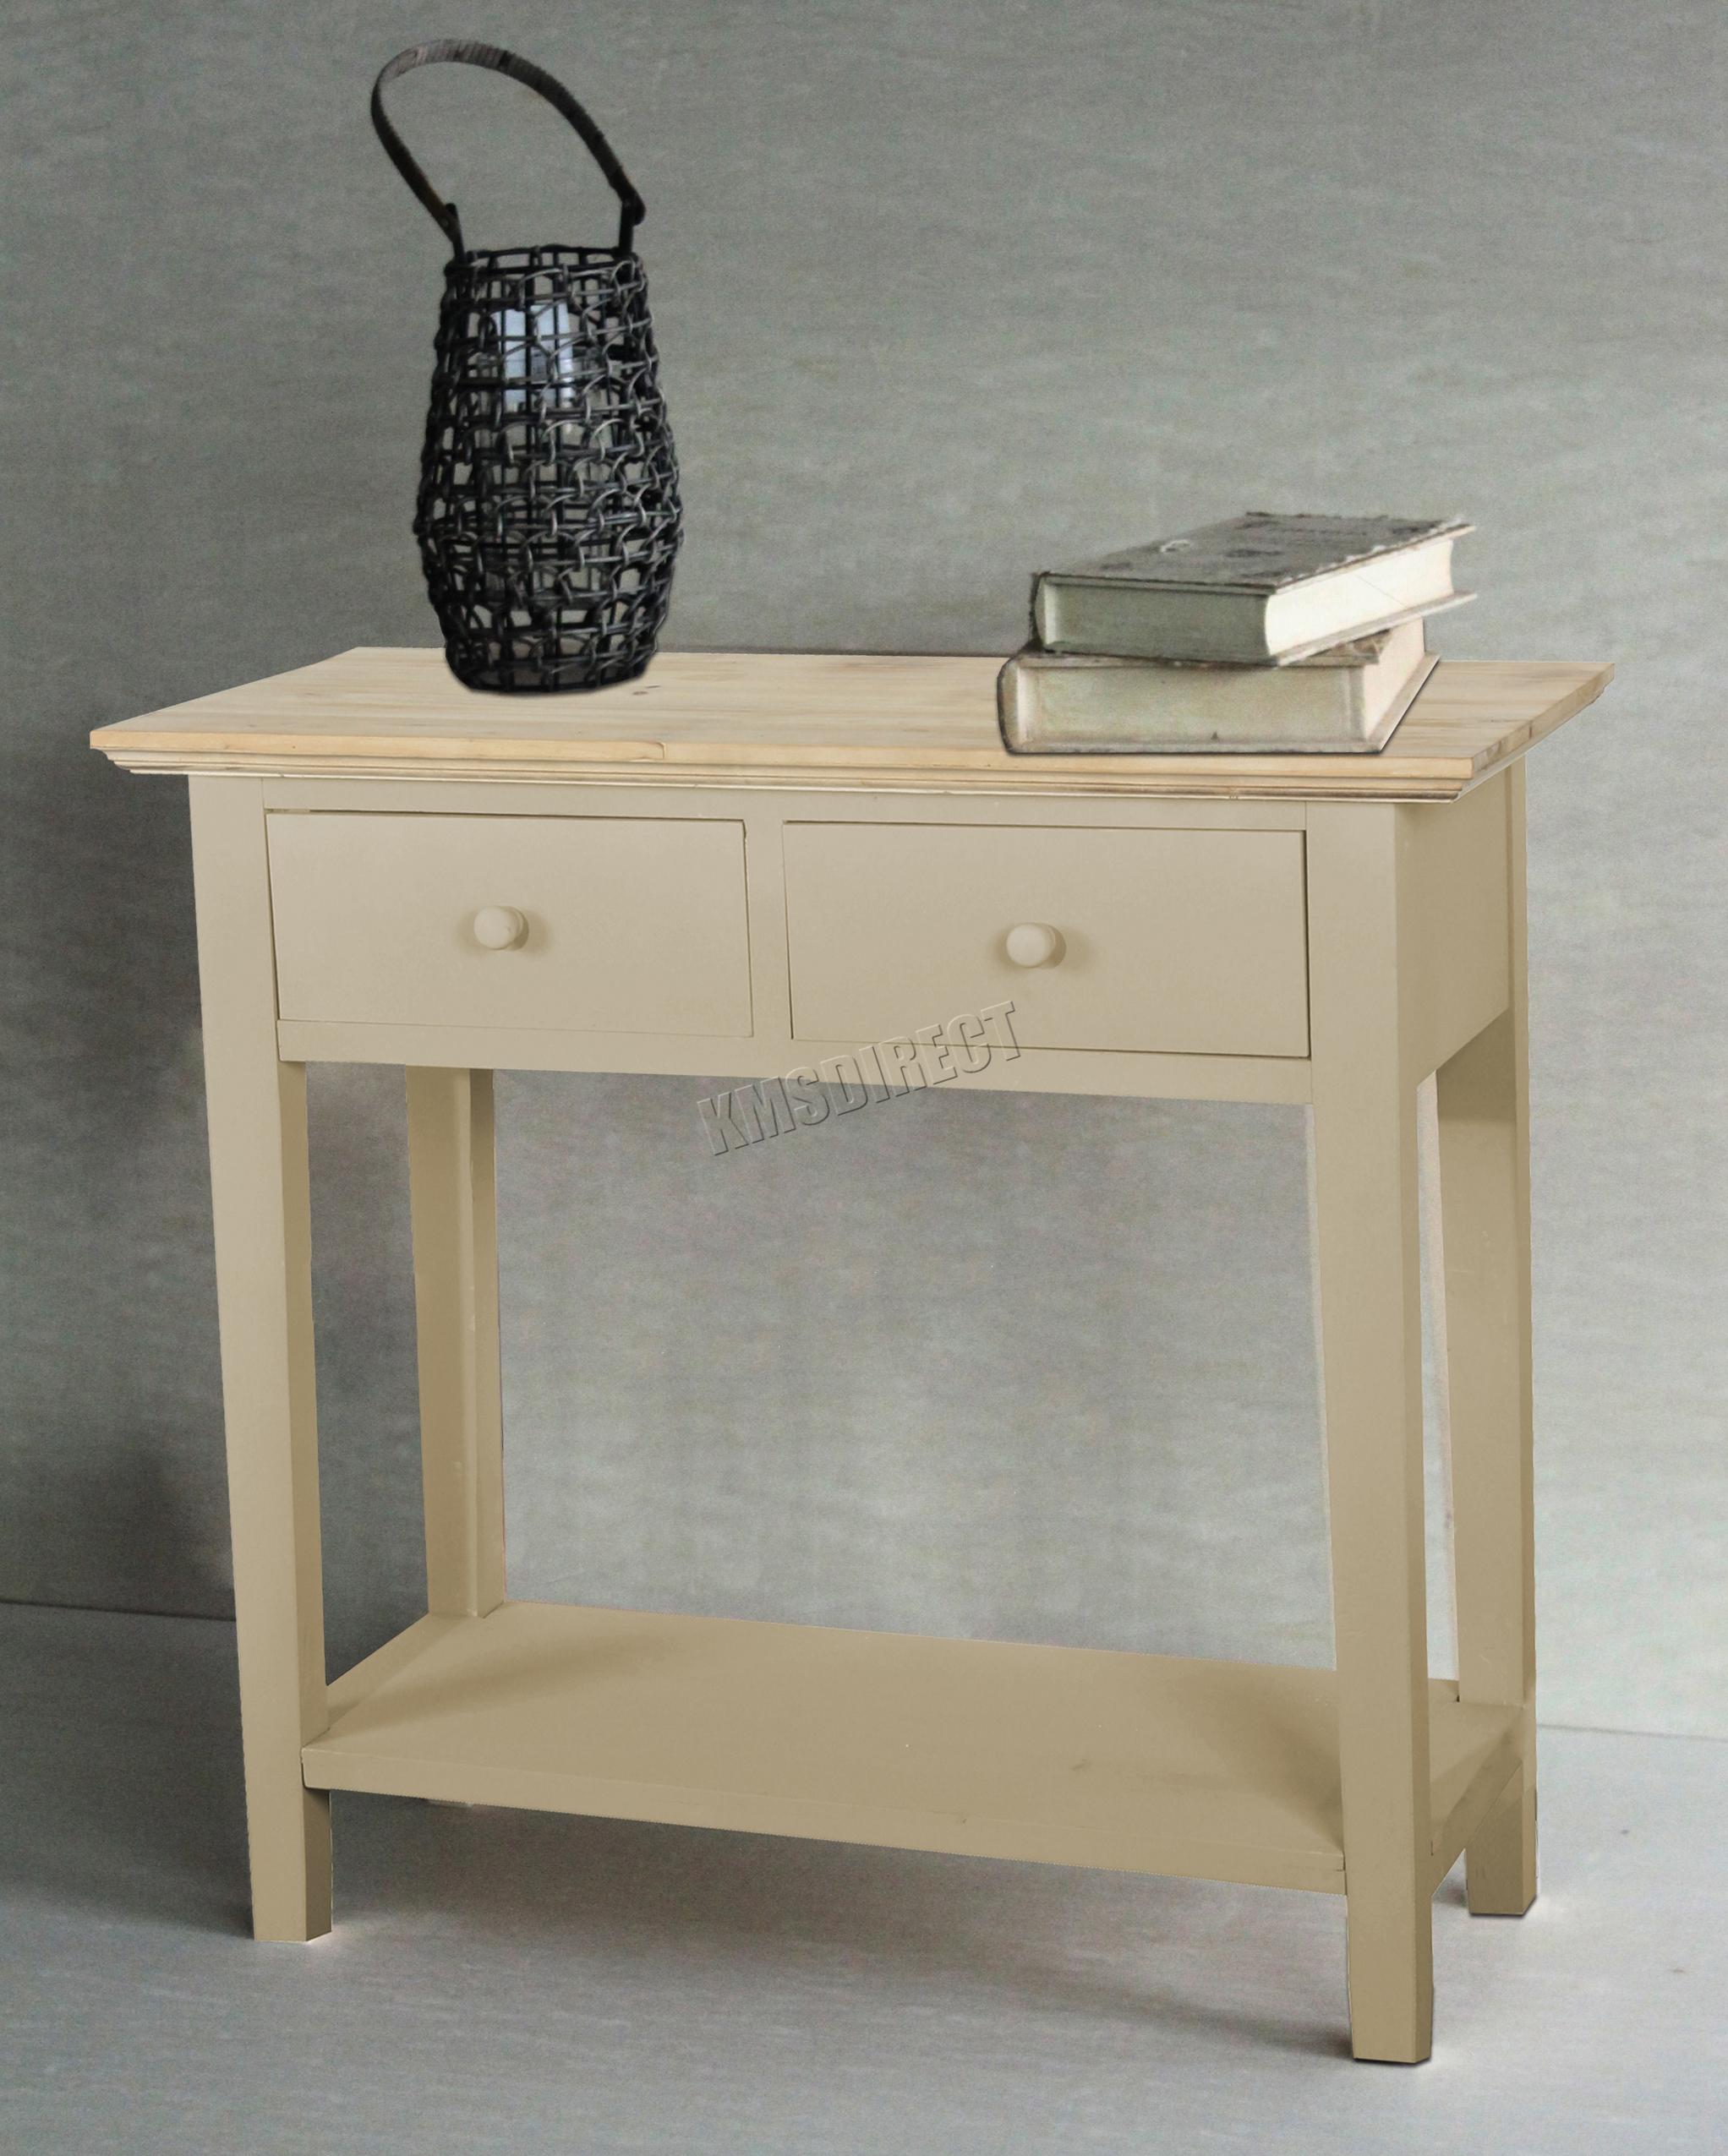 foxhunter table console 2 tiroirs bois couloir c t stockage hall cuisine ctw01 ebay. Black Bedroom Furniture Sets. Home Design Ideas